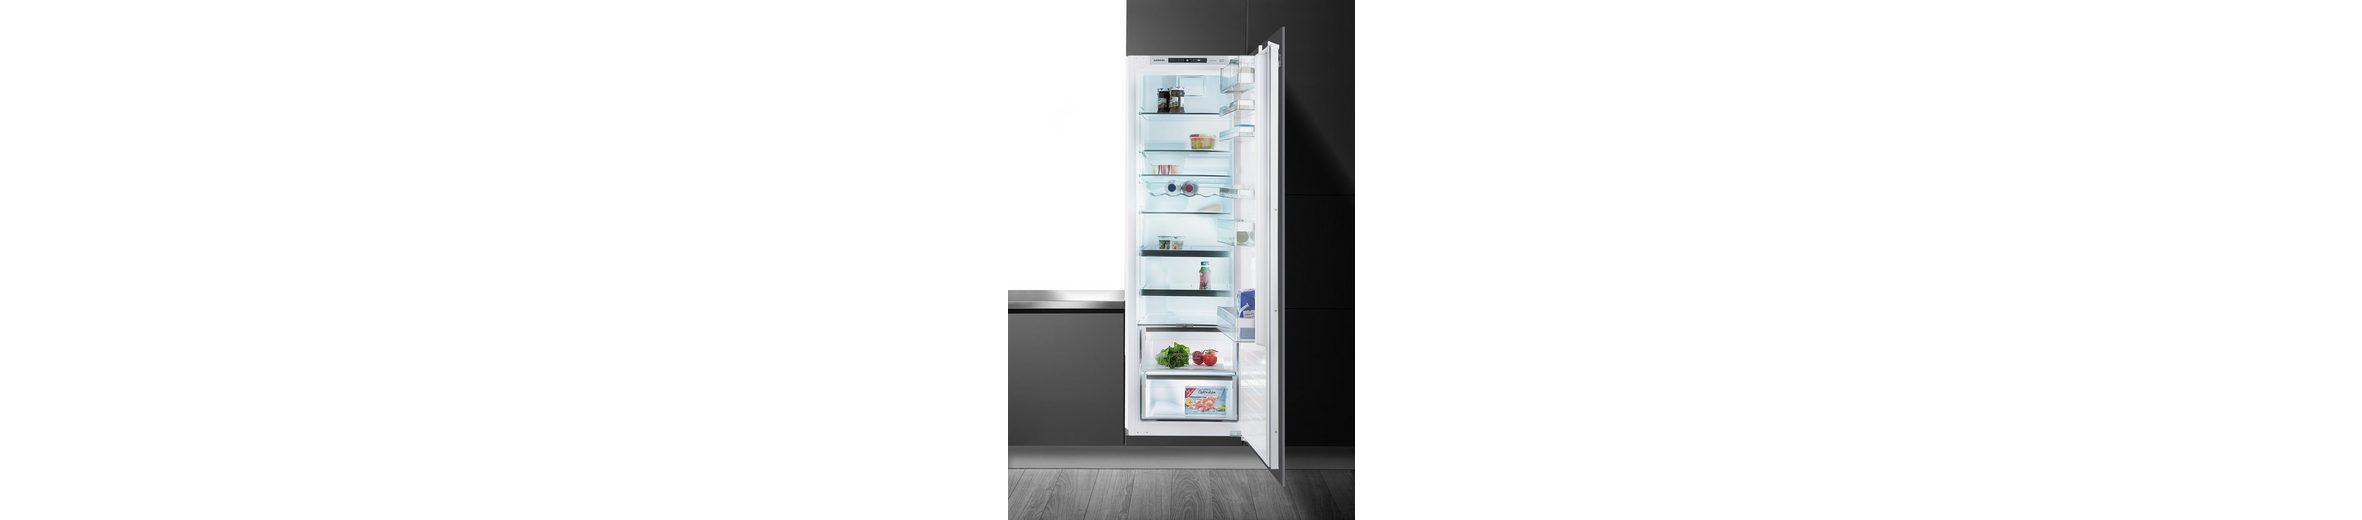 Siemens integrierbarer Einbau-Kühlschrank KI81RAF30, A++, 177,5 cm